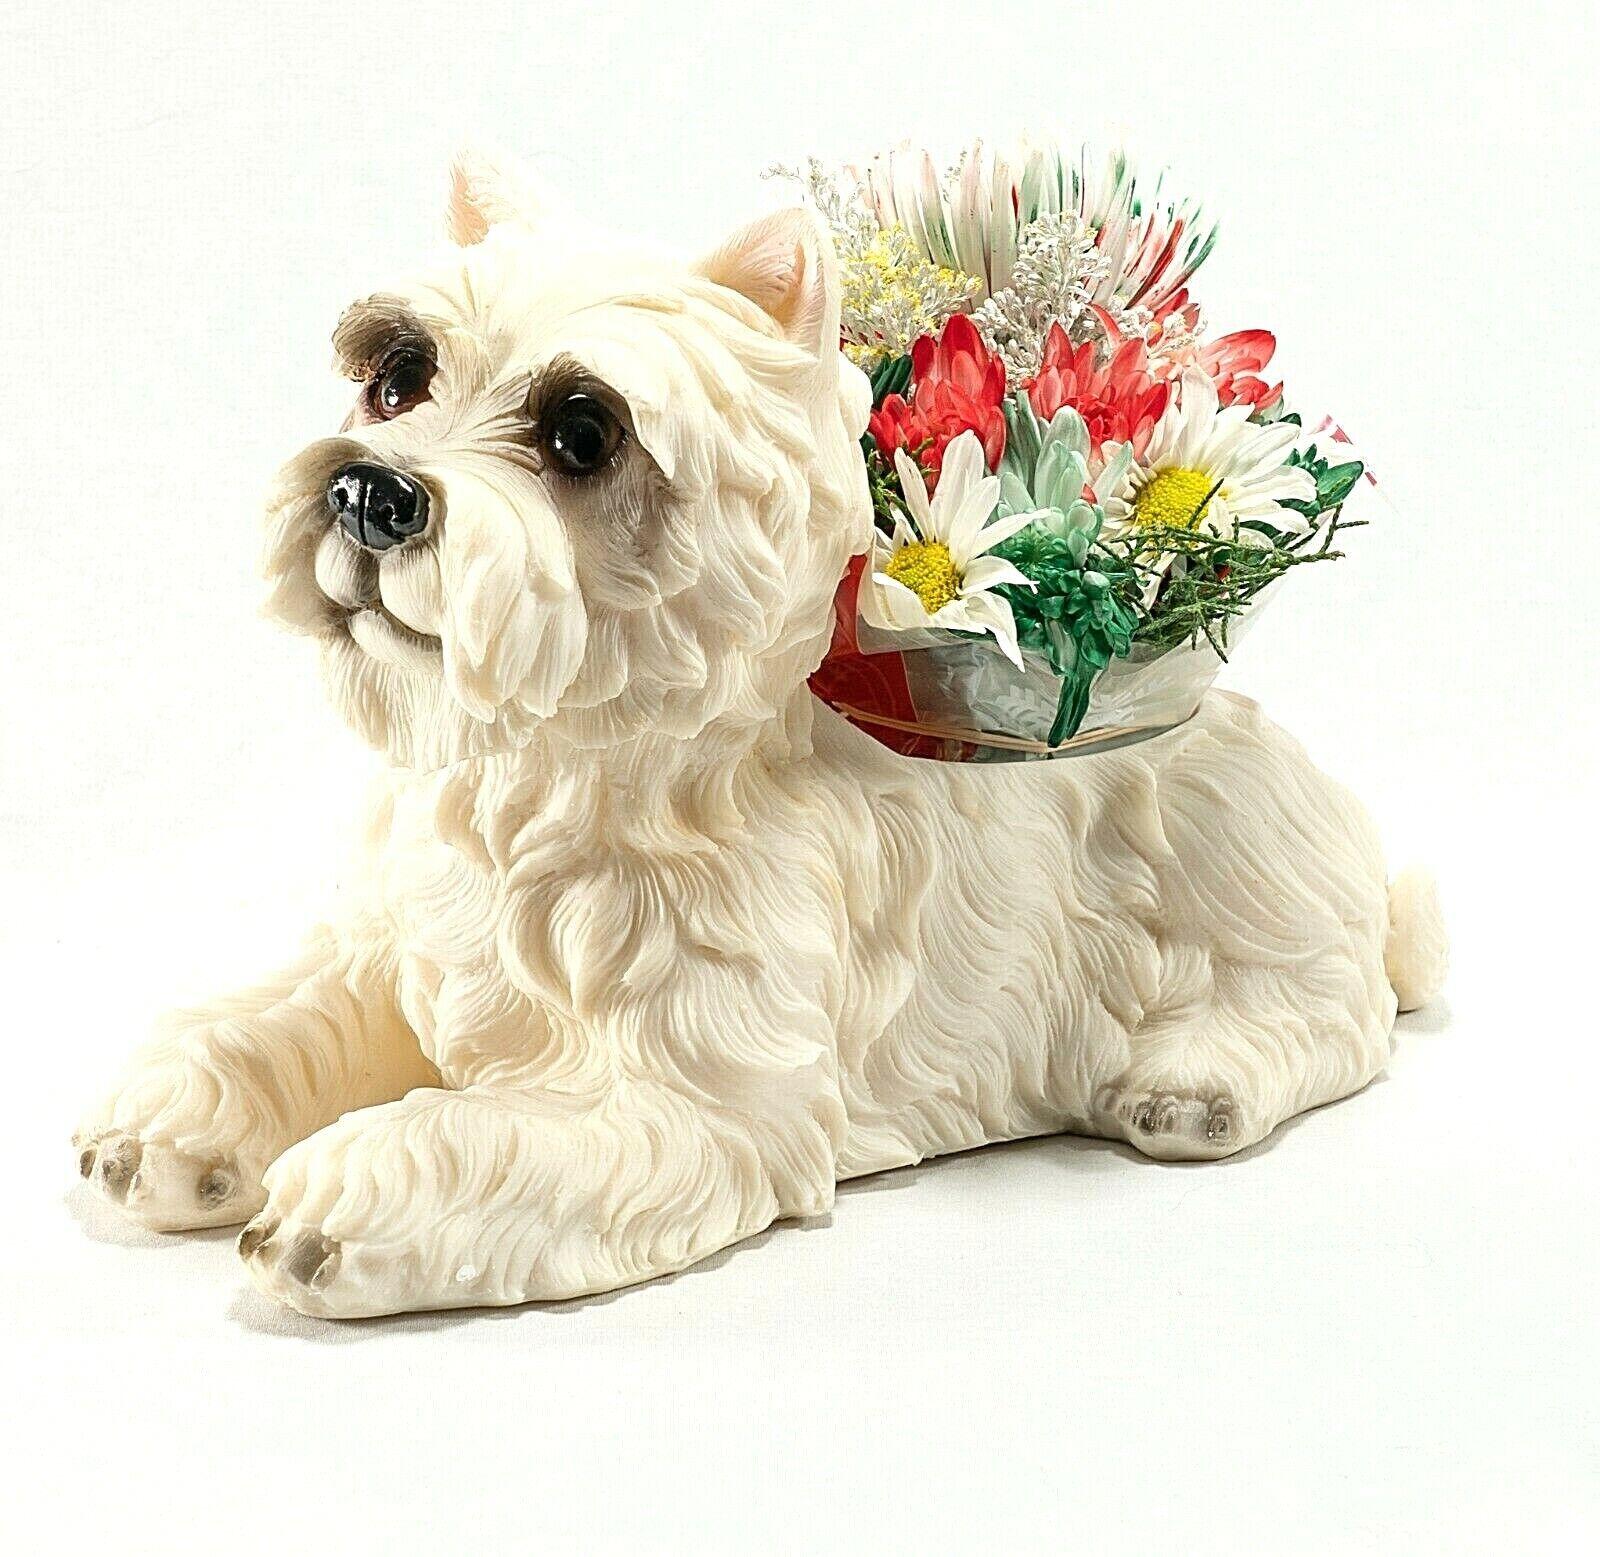 WESTIE Life-Like Planter Dog Hand Painted Poly Stone Beautiful High Quality NIB Animals